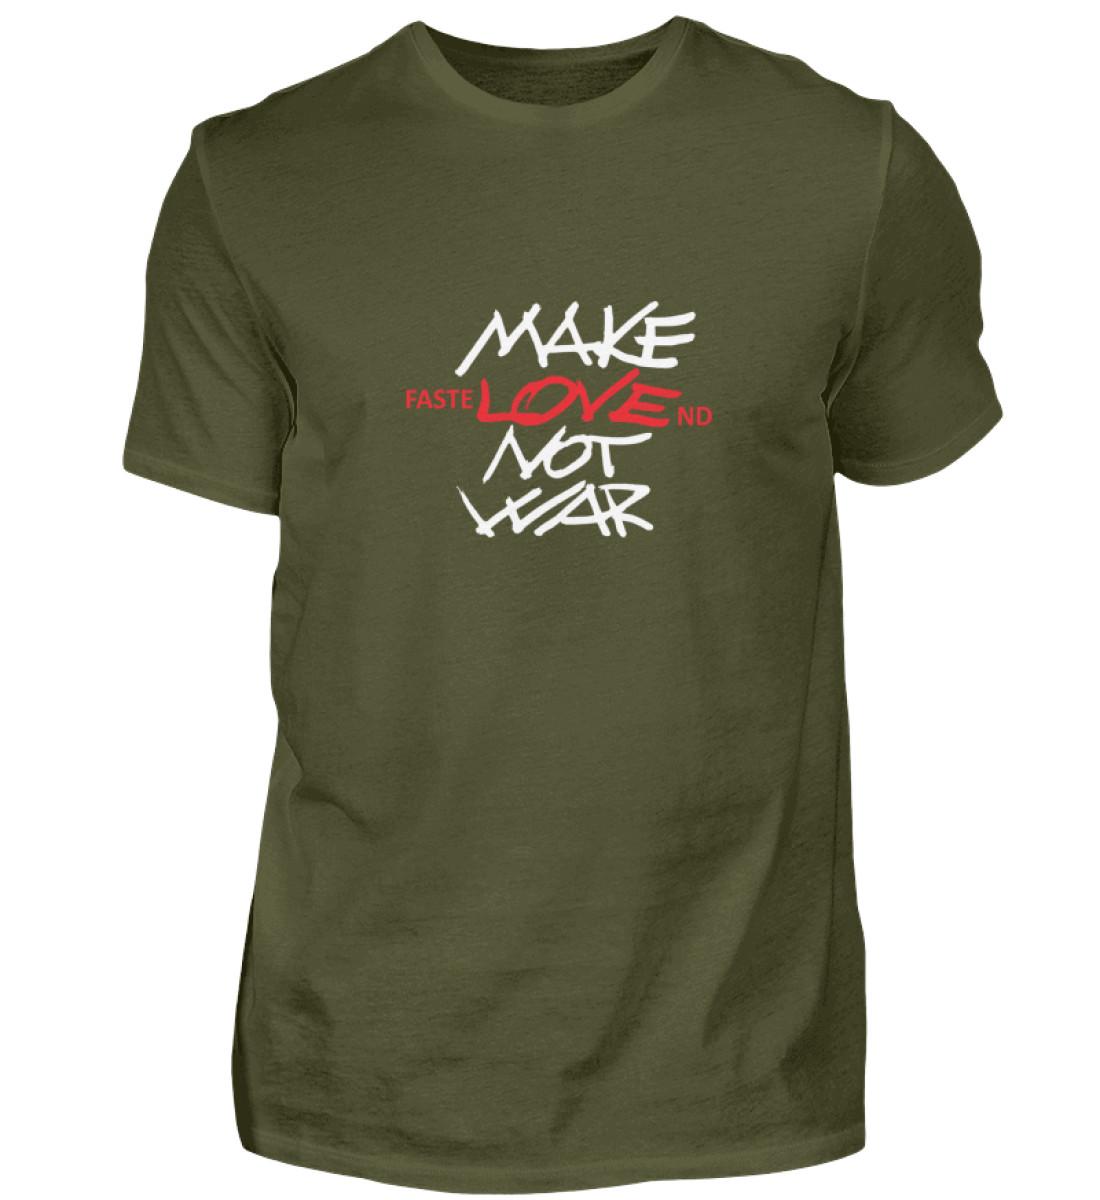 FasteLOVEnd Herren T-Shirt - Herren Shirt-1109